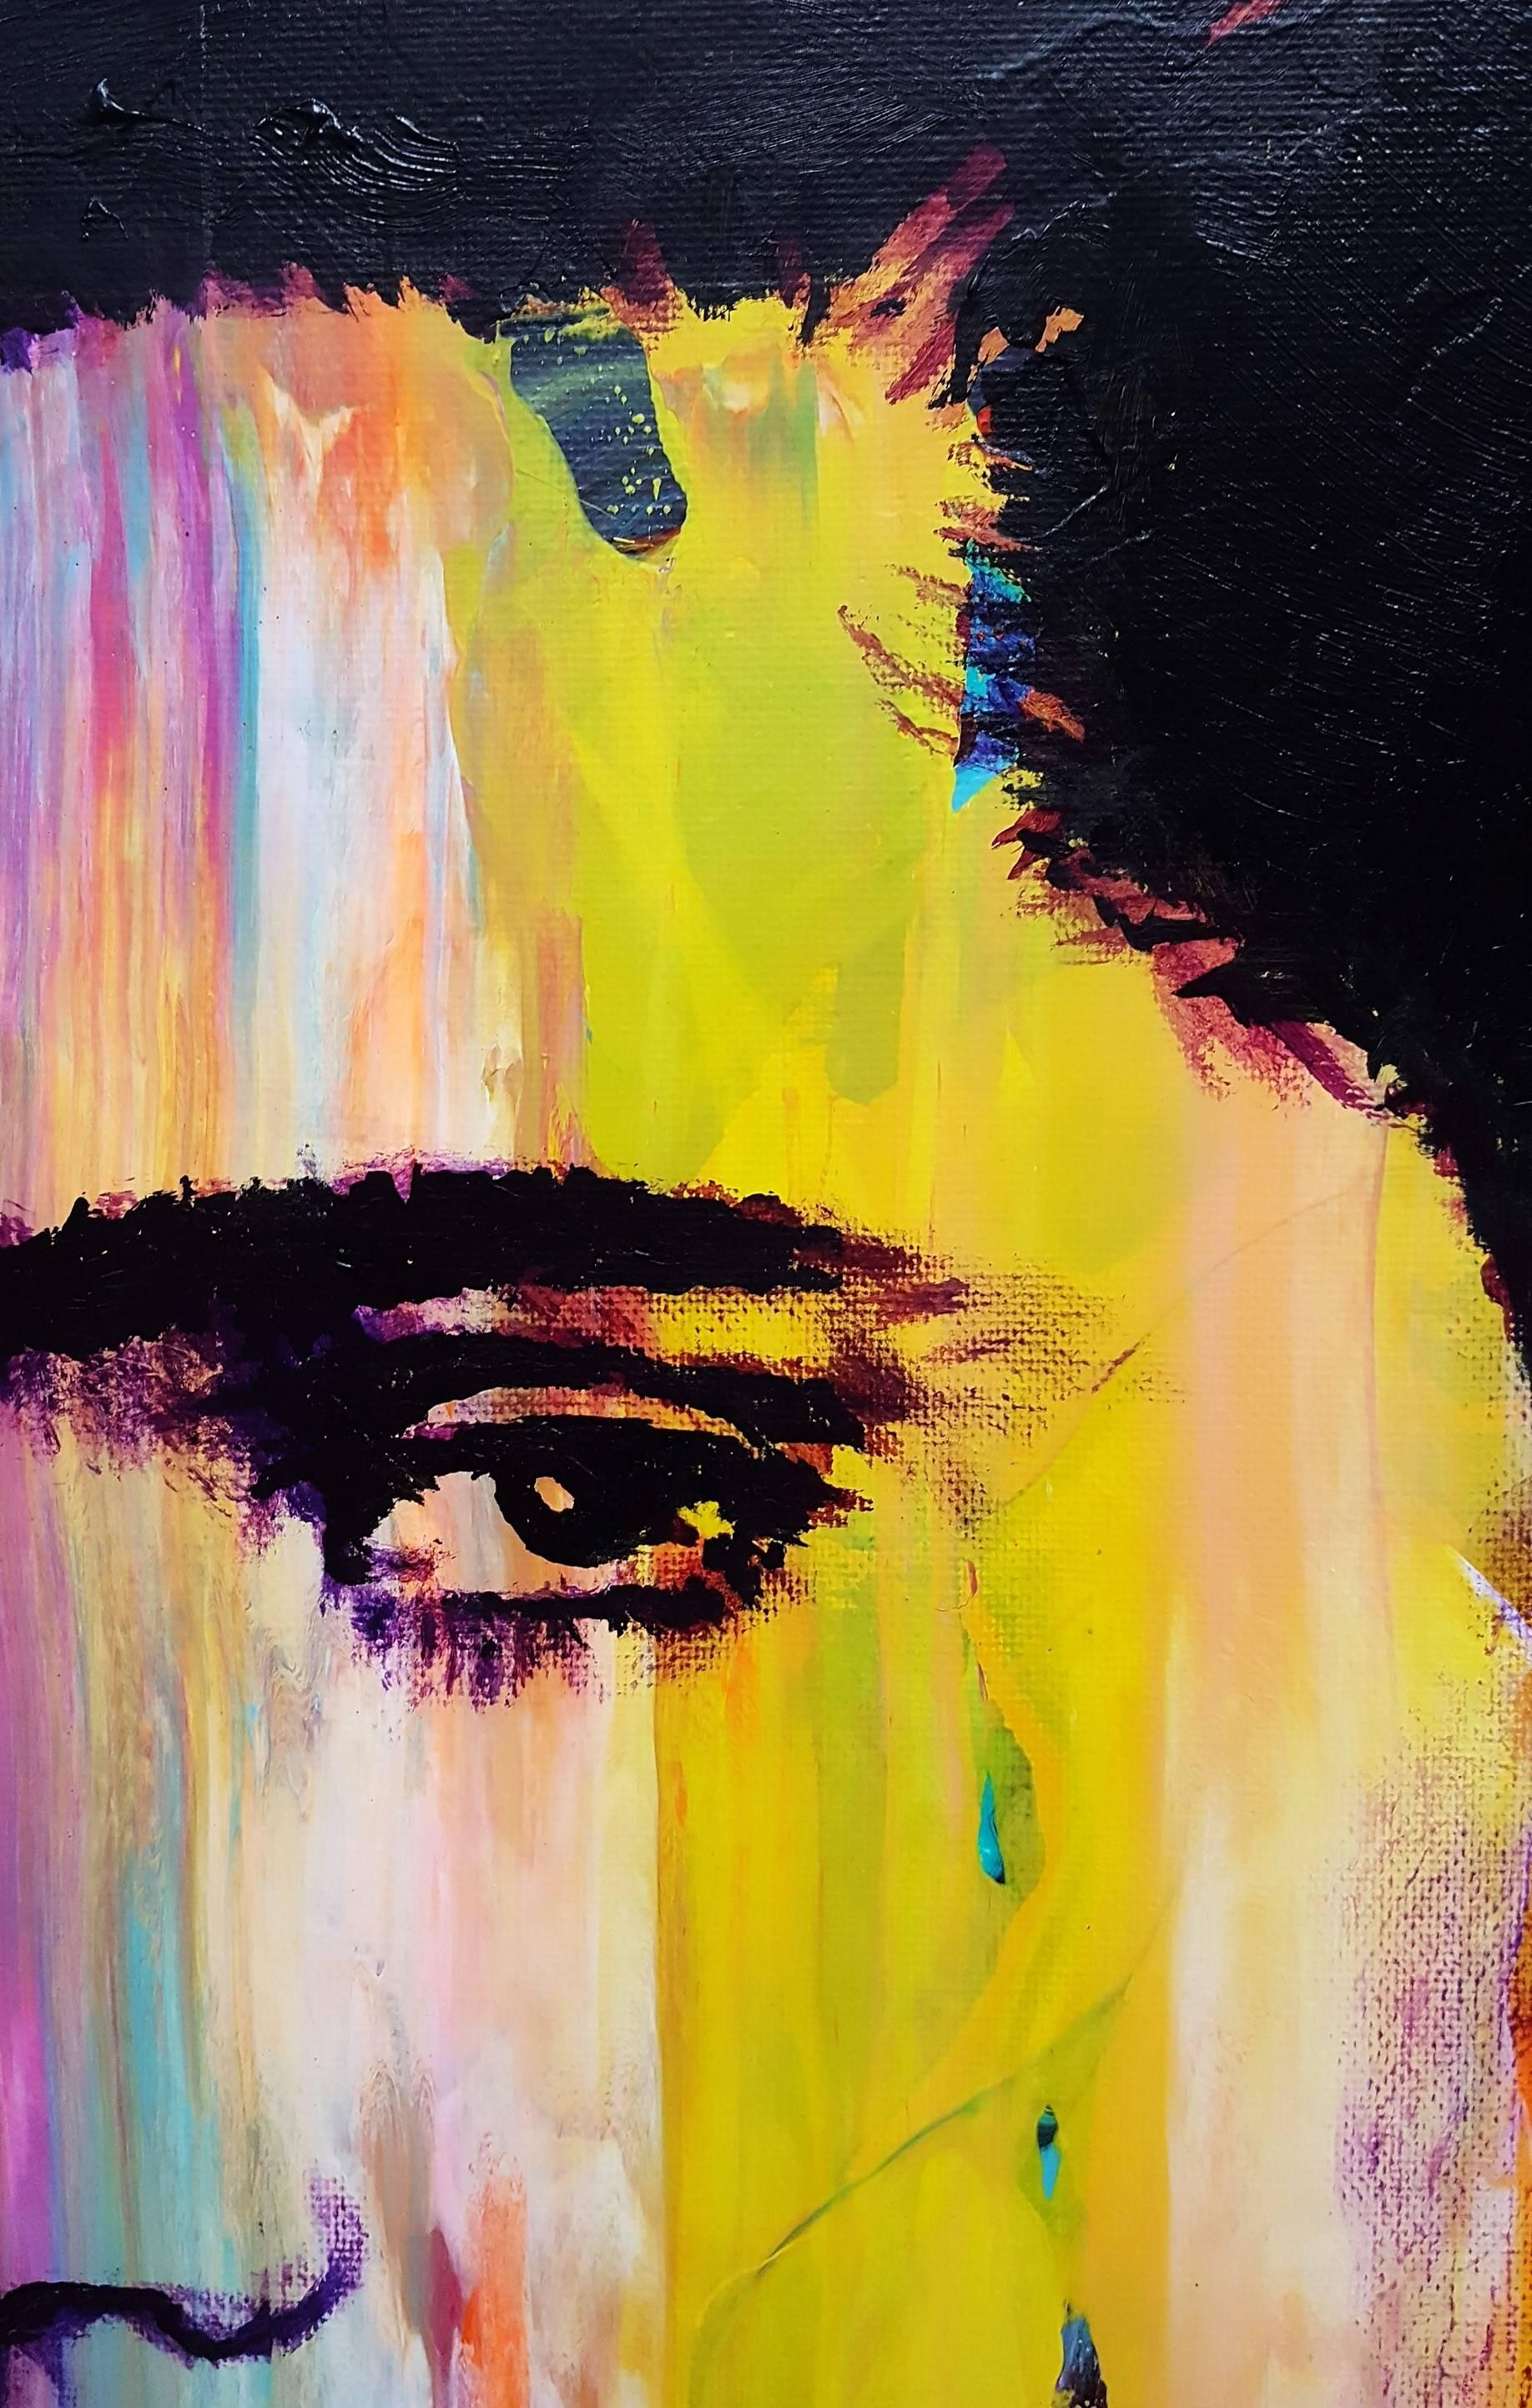 Jack Graves III - Elvis Presley Icon III, Painting at 1stdibs